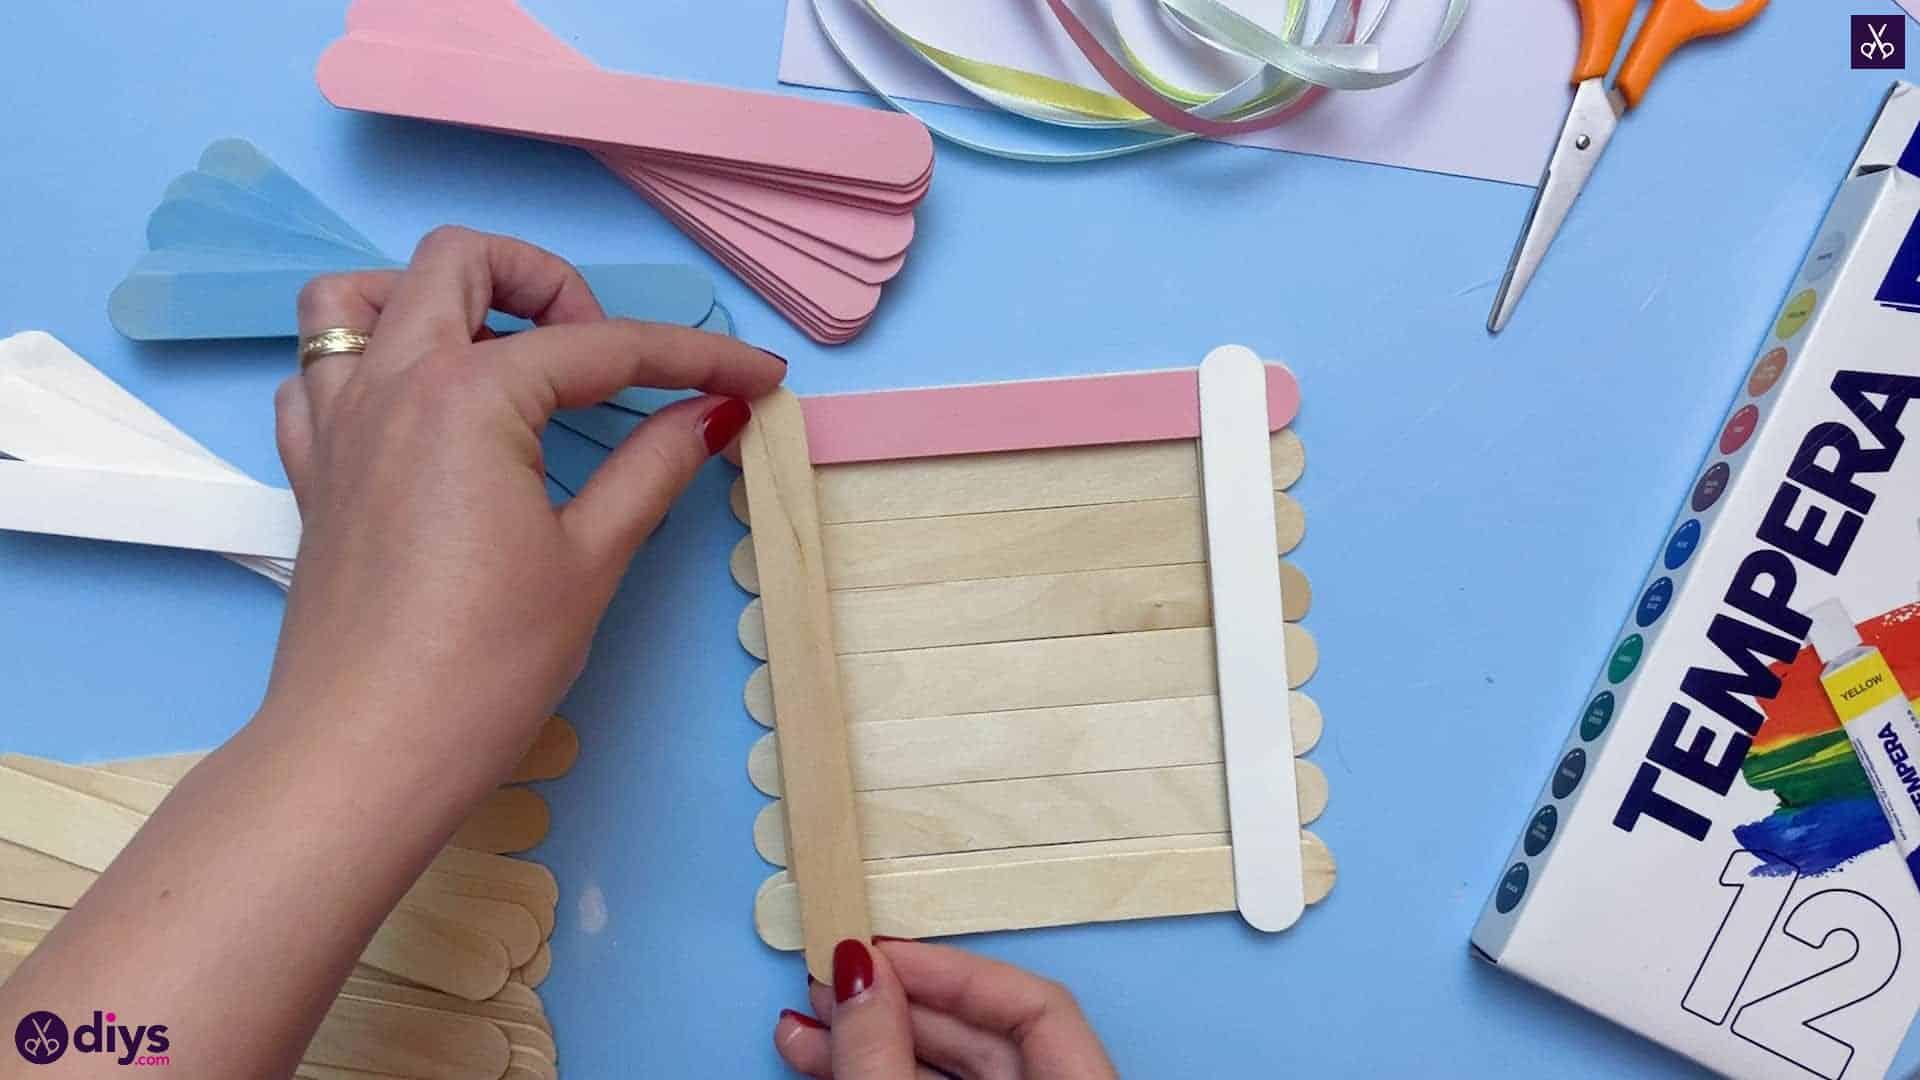 Diy popsicle stick jewelry box step 4